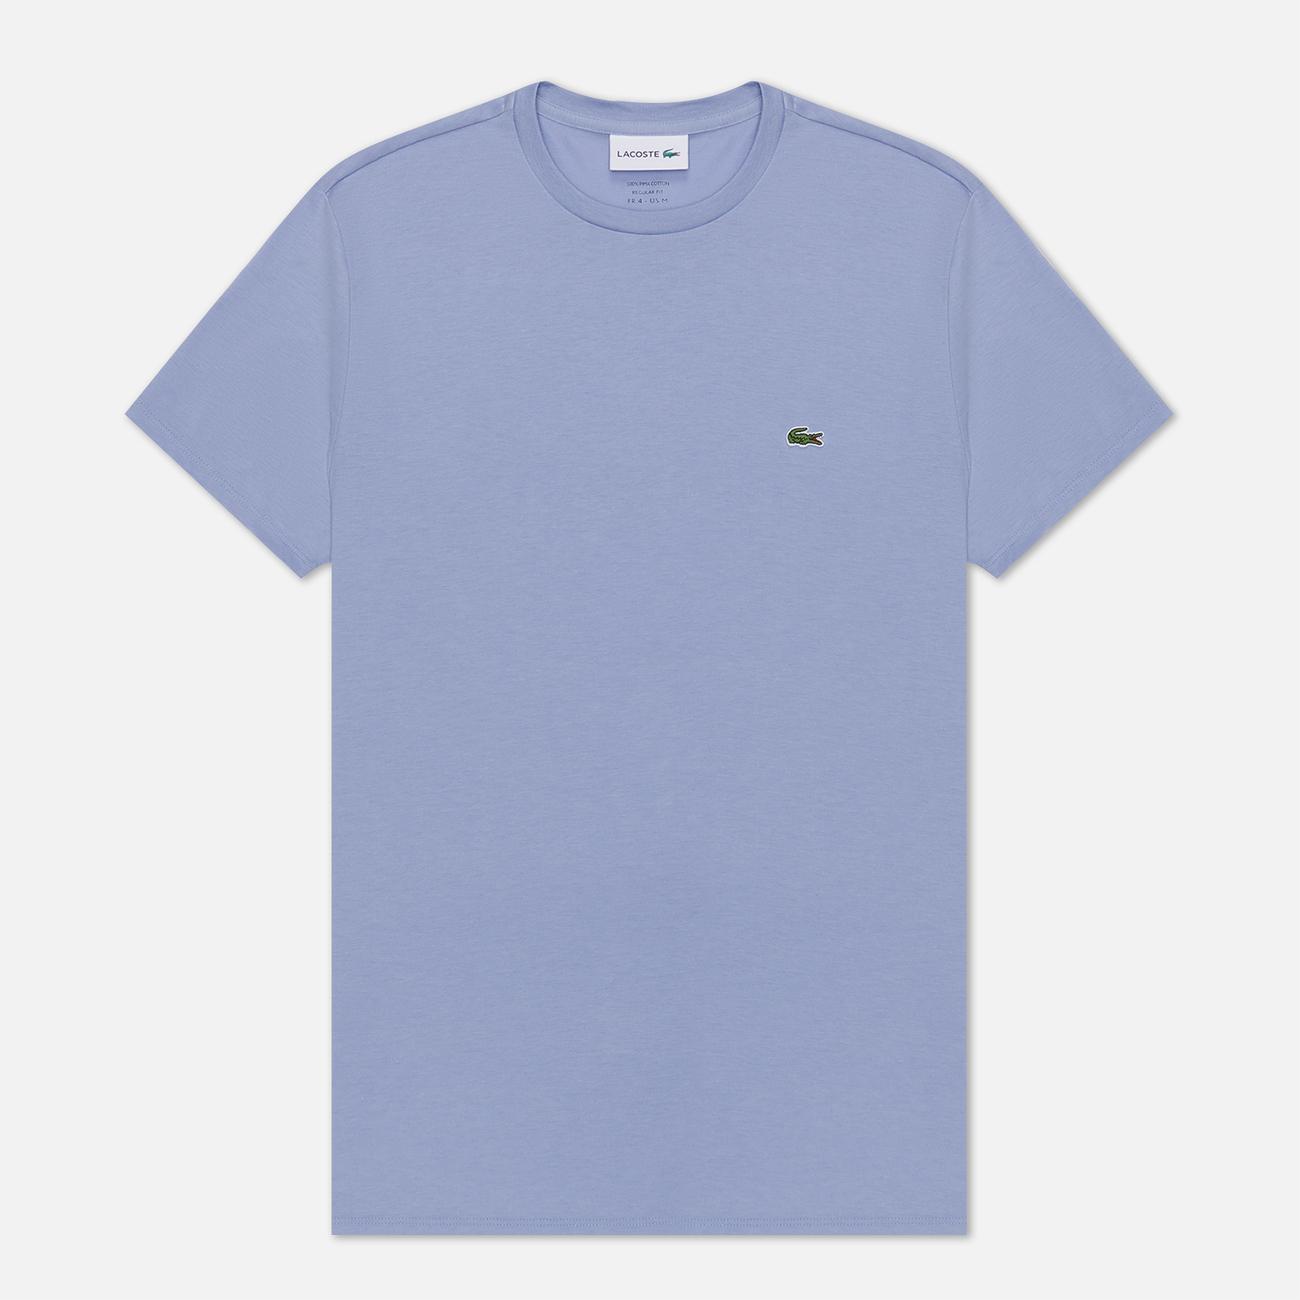 Мужская футболка Lacoste Crew Neck Pima Cotton Purple